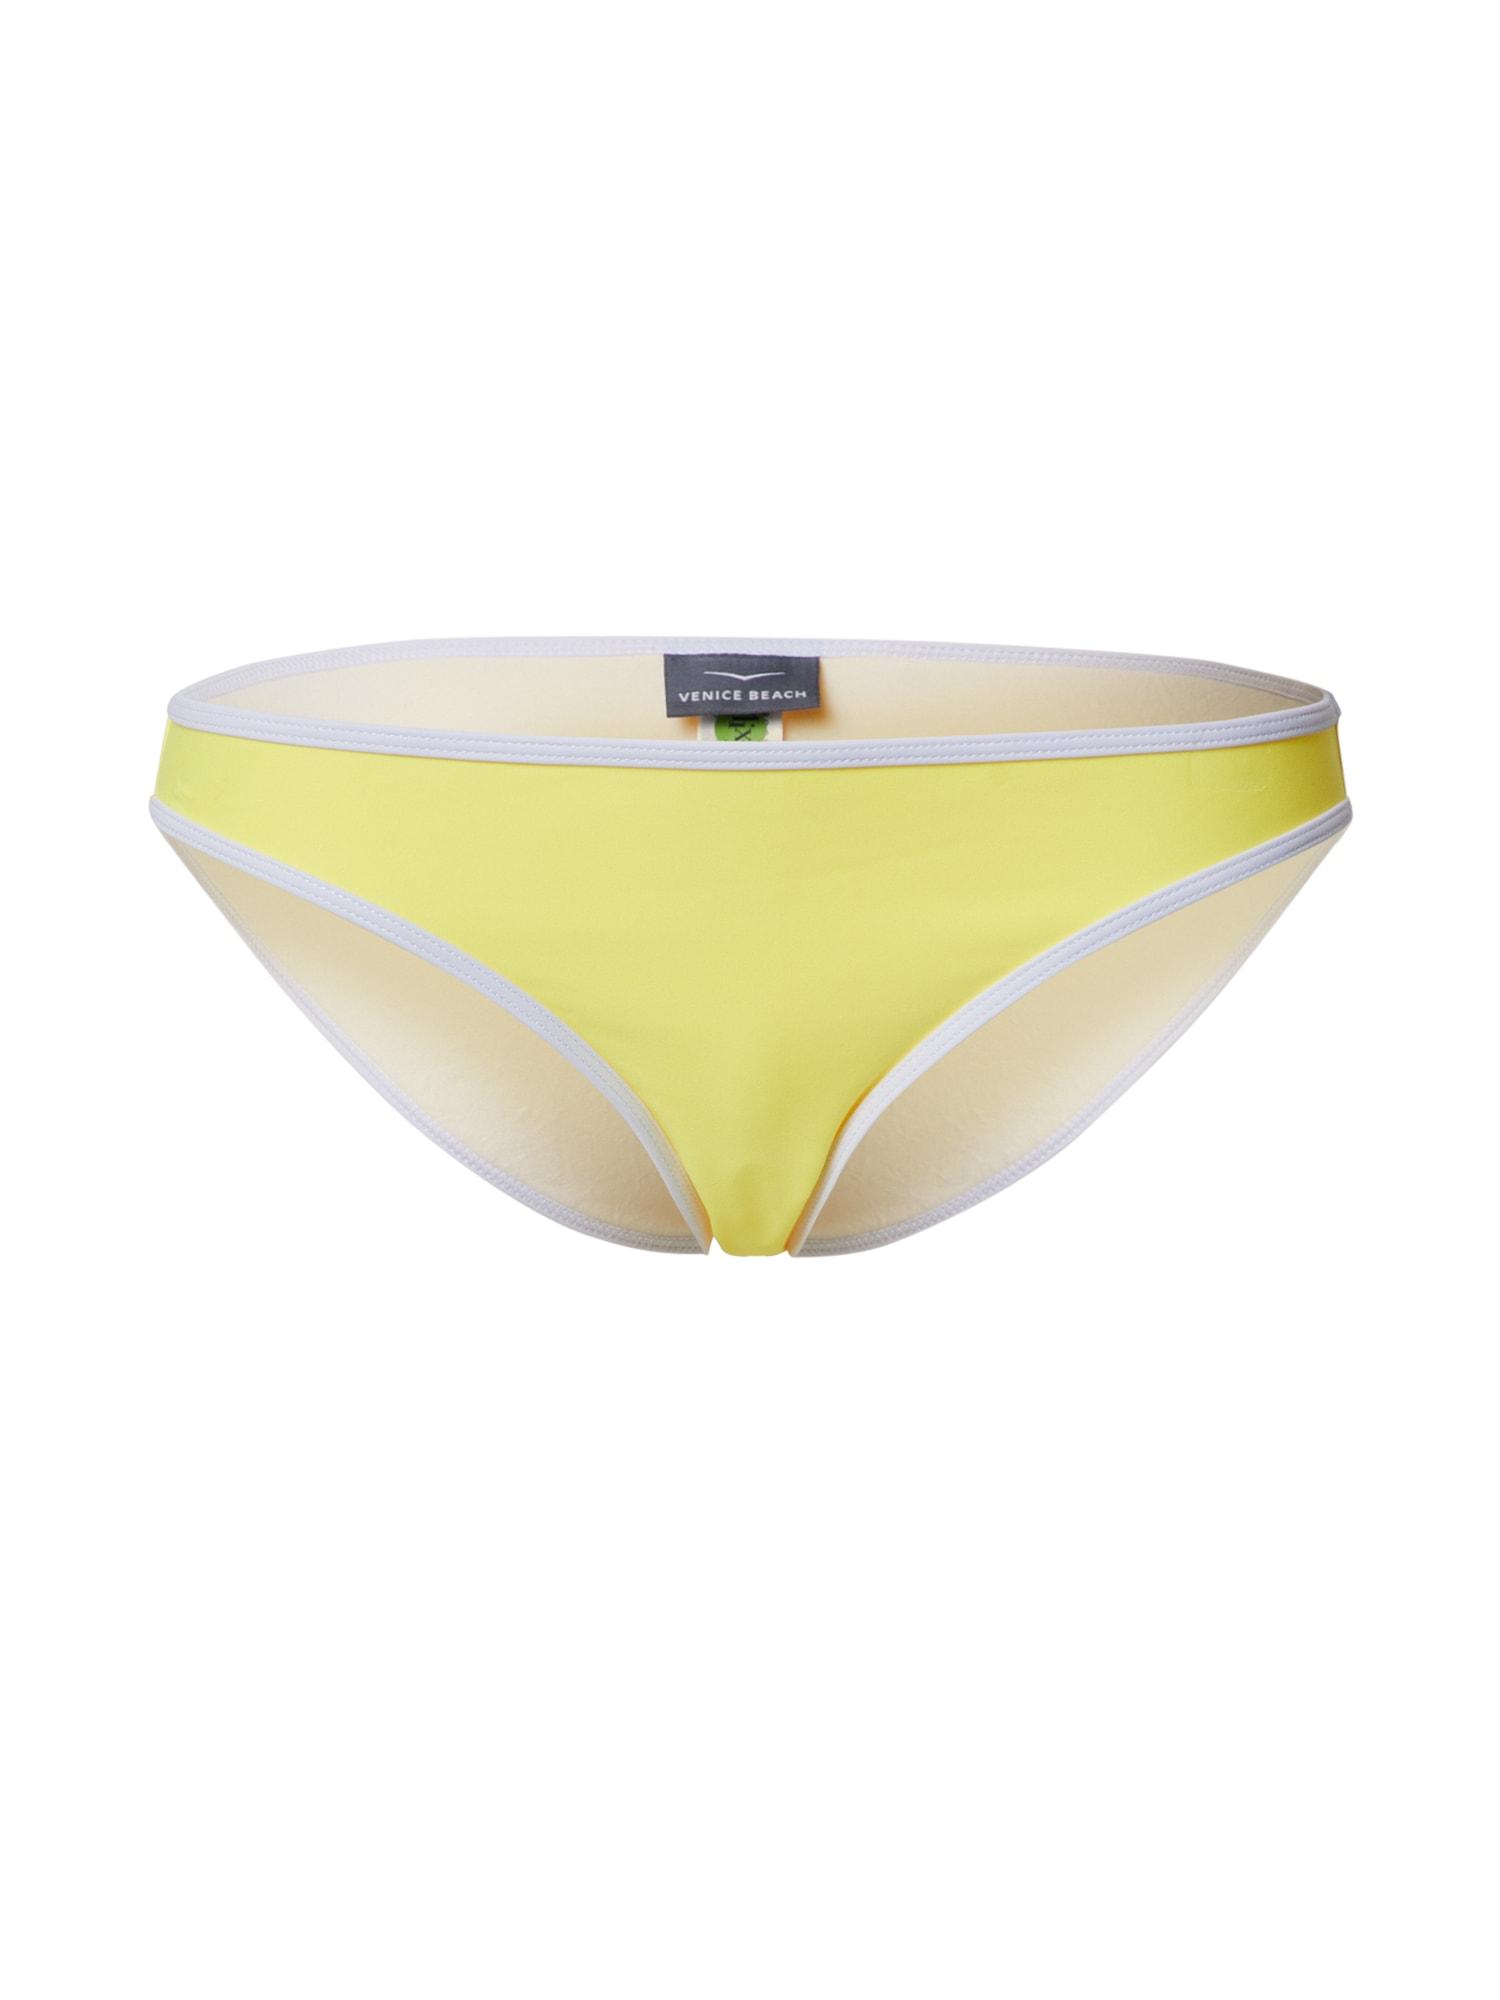 VENICE BEACH Bikinio kelnaitės geltona / balta